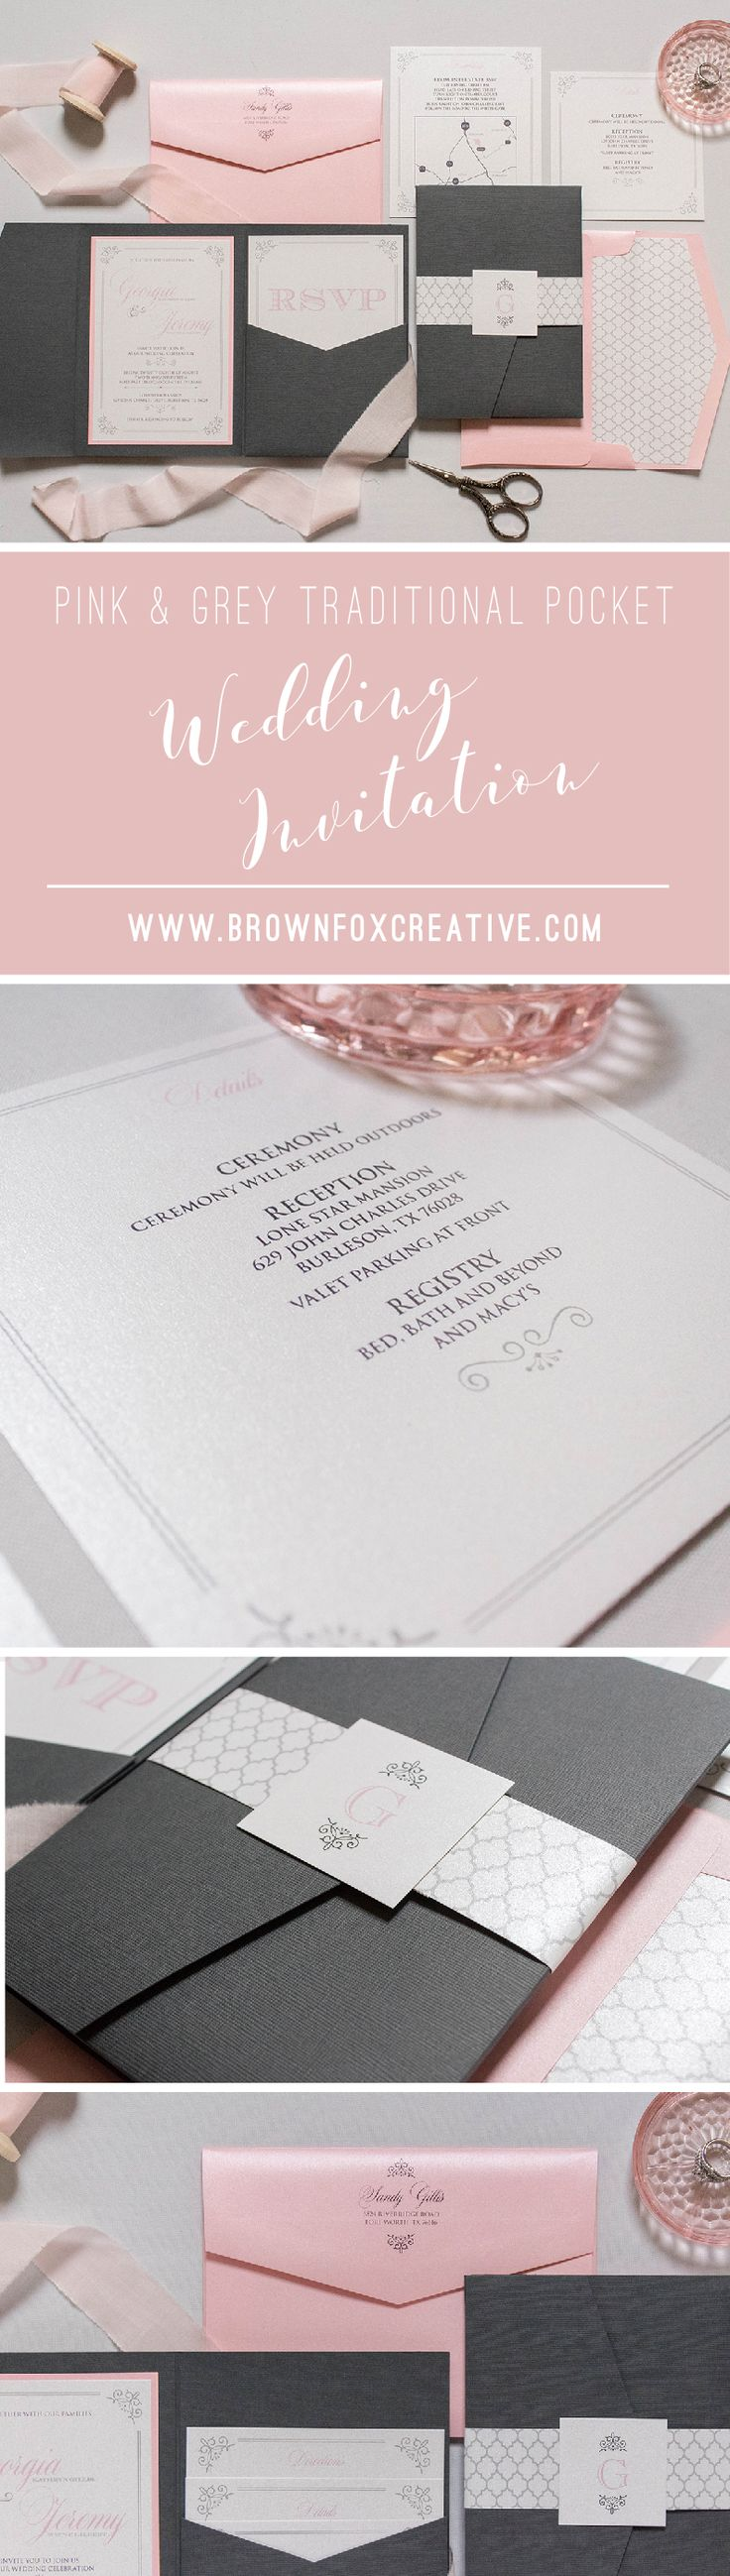 how to return address wedding envelopes%0A  x  Grey  Pink  Silver Pocket Wedding Invitation with Return Address  Printing  Enclosure Band